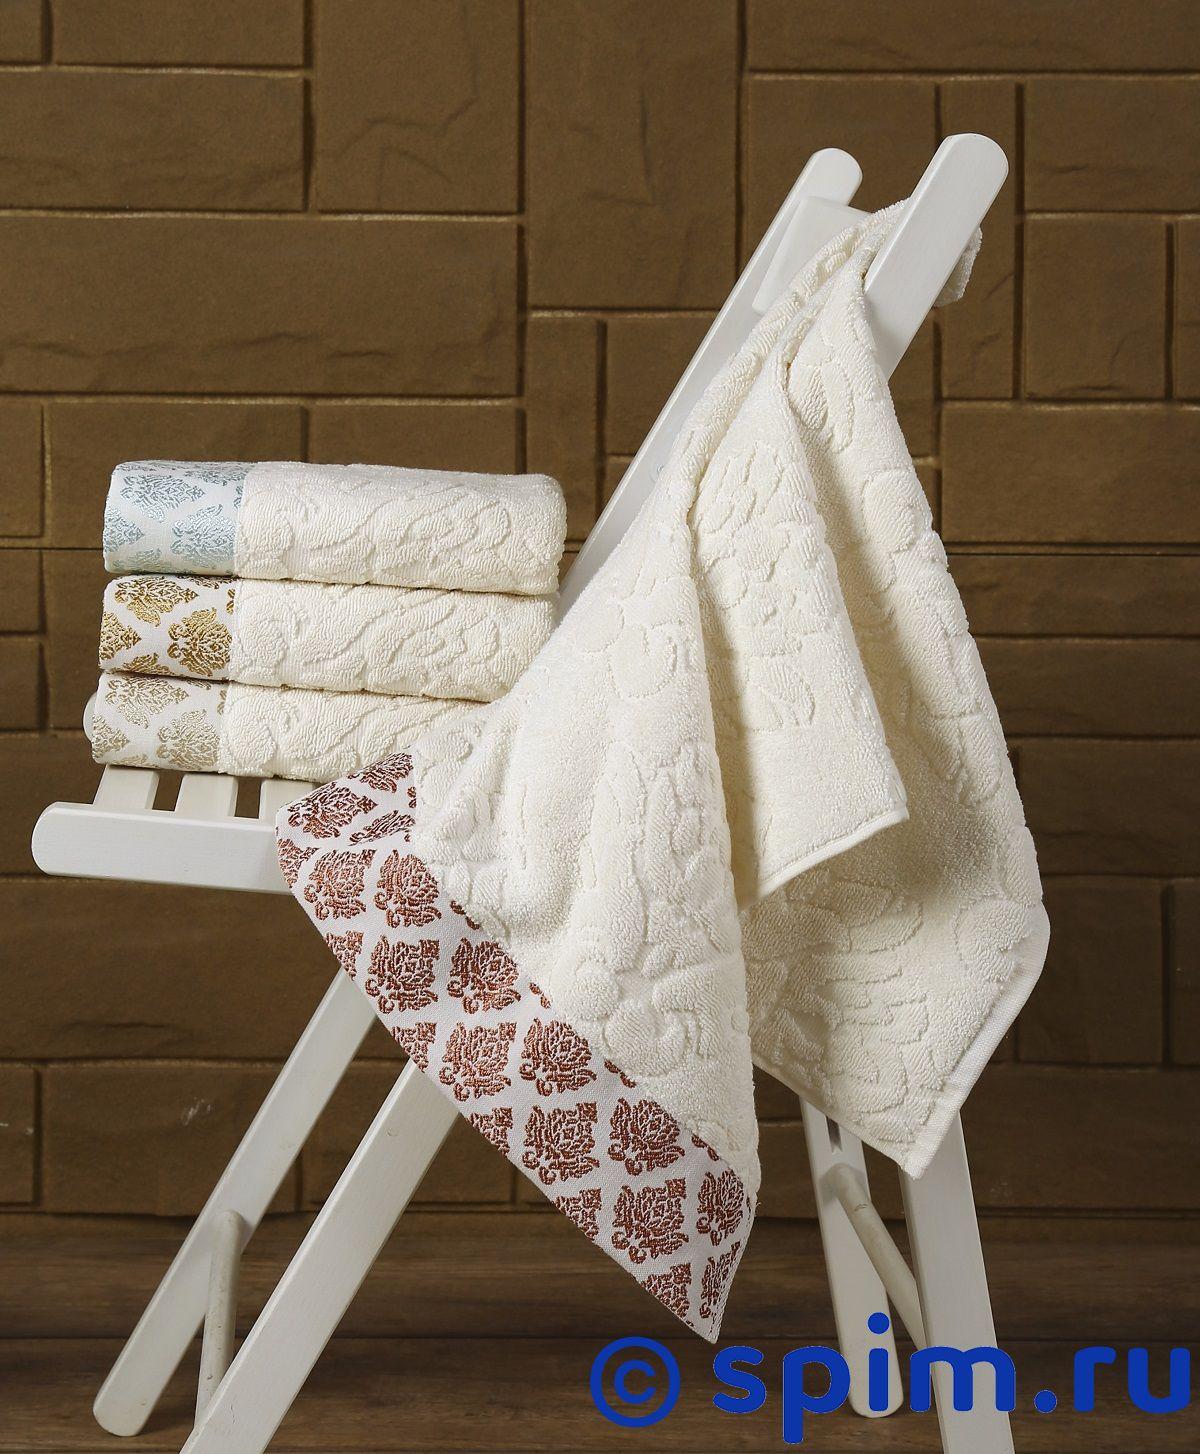 Набор полотенец Lucente Estelle 50х90 см сирень classik б 50х90 70х130 в коробке набор полотенец фиеста